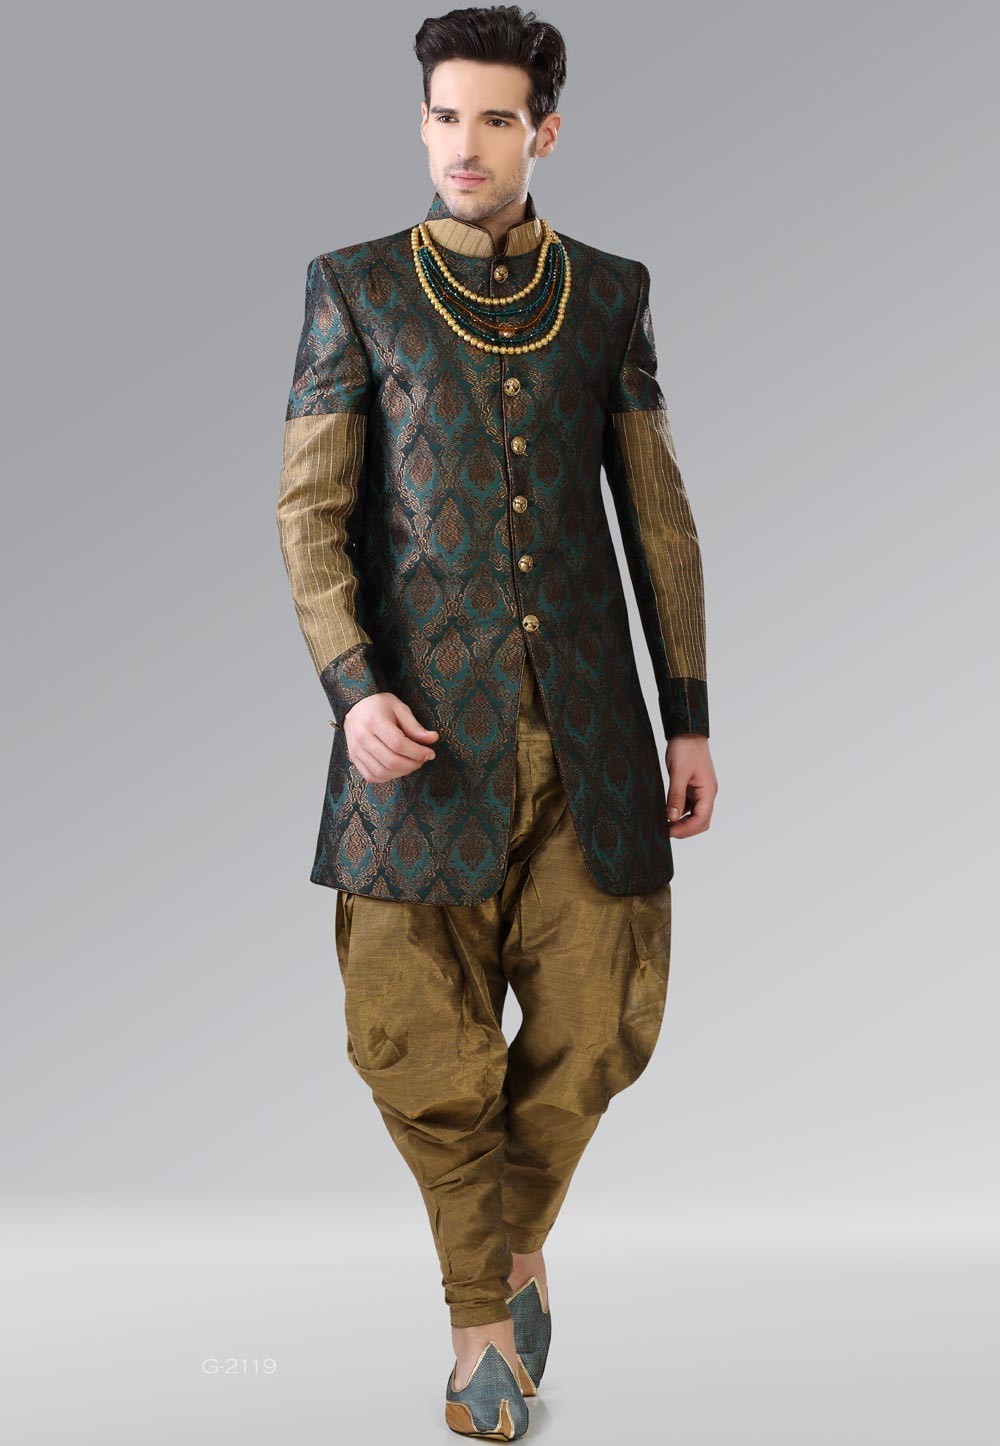 Green,Golden Color Brocade Men's Indo Western